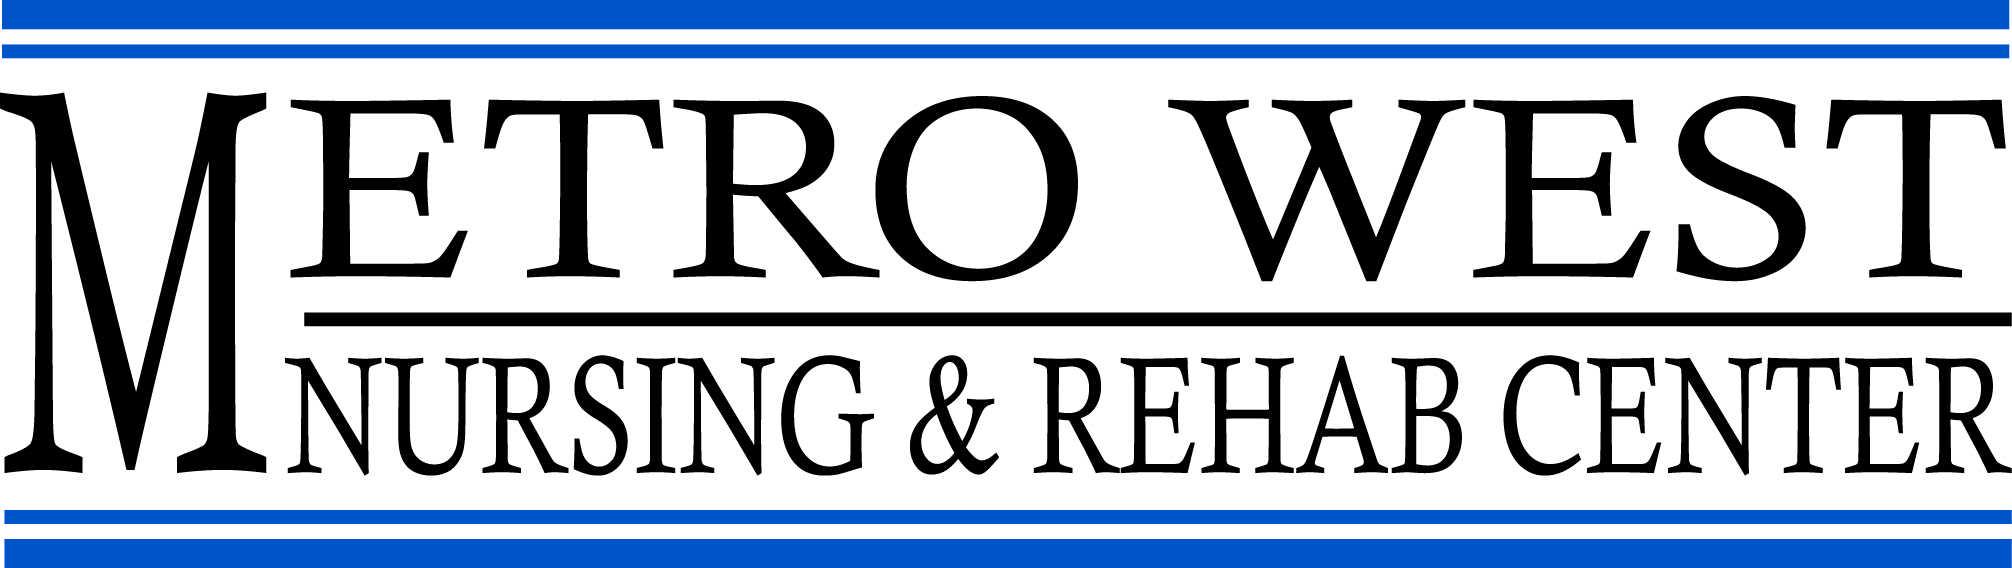 Metro West Nursing and Rehab Center logo